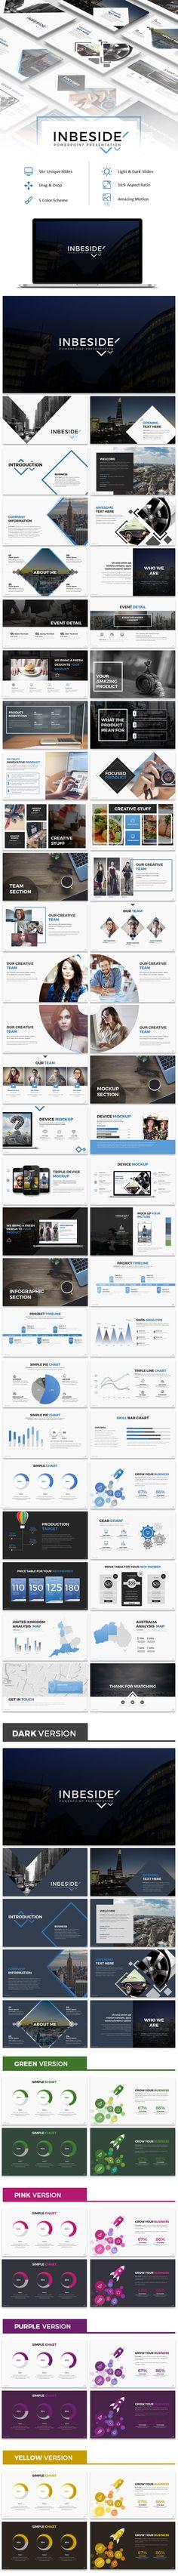 Inbeside Powerpoint Template - Business PowerPoint Templates